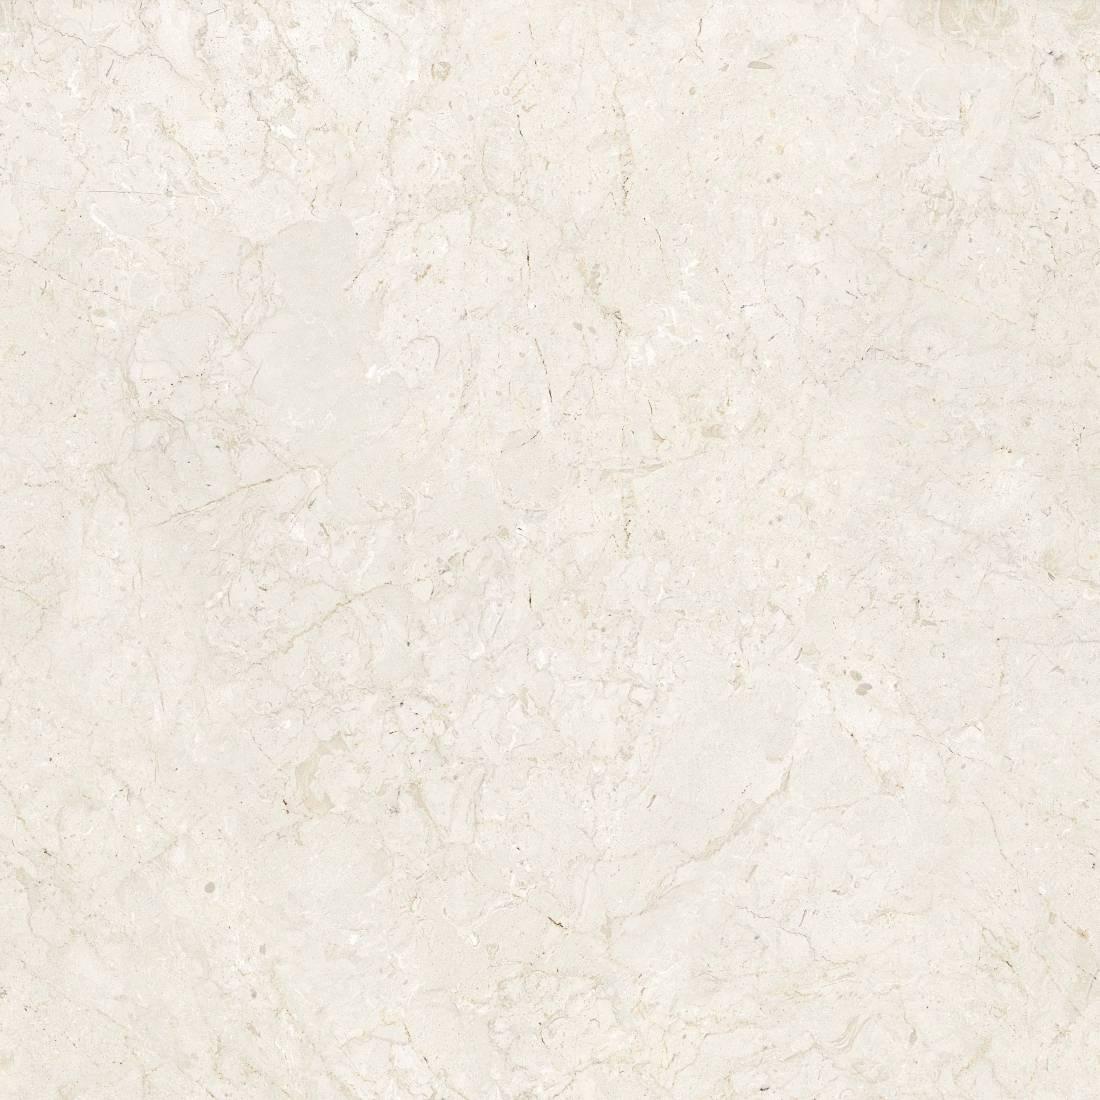 Crema Marfil 60x60 Light Ivory Polished 1